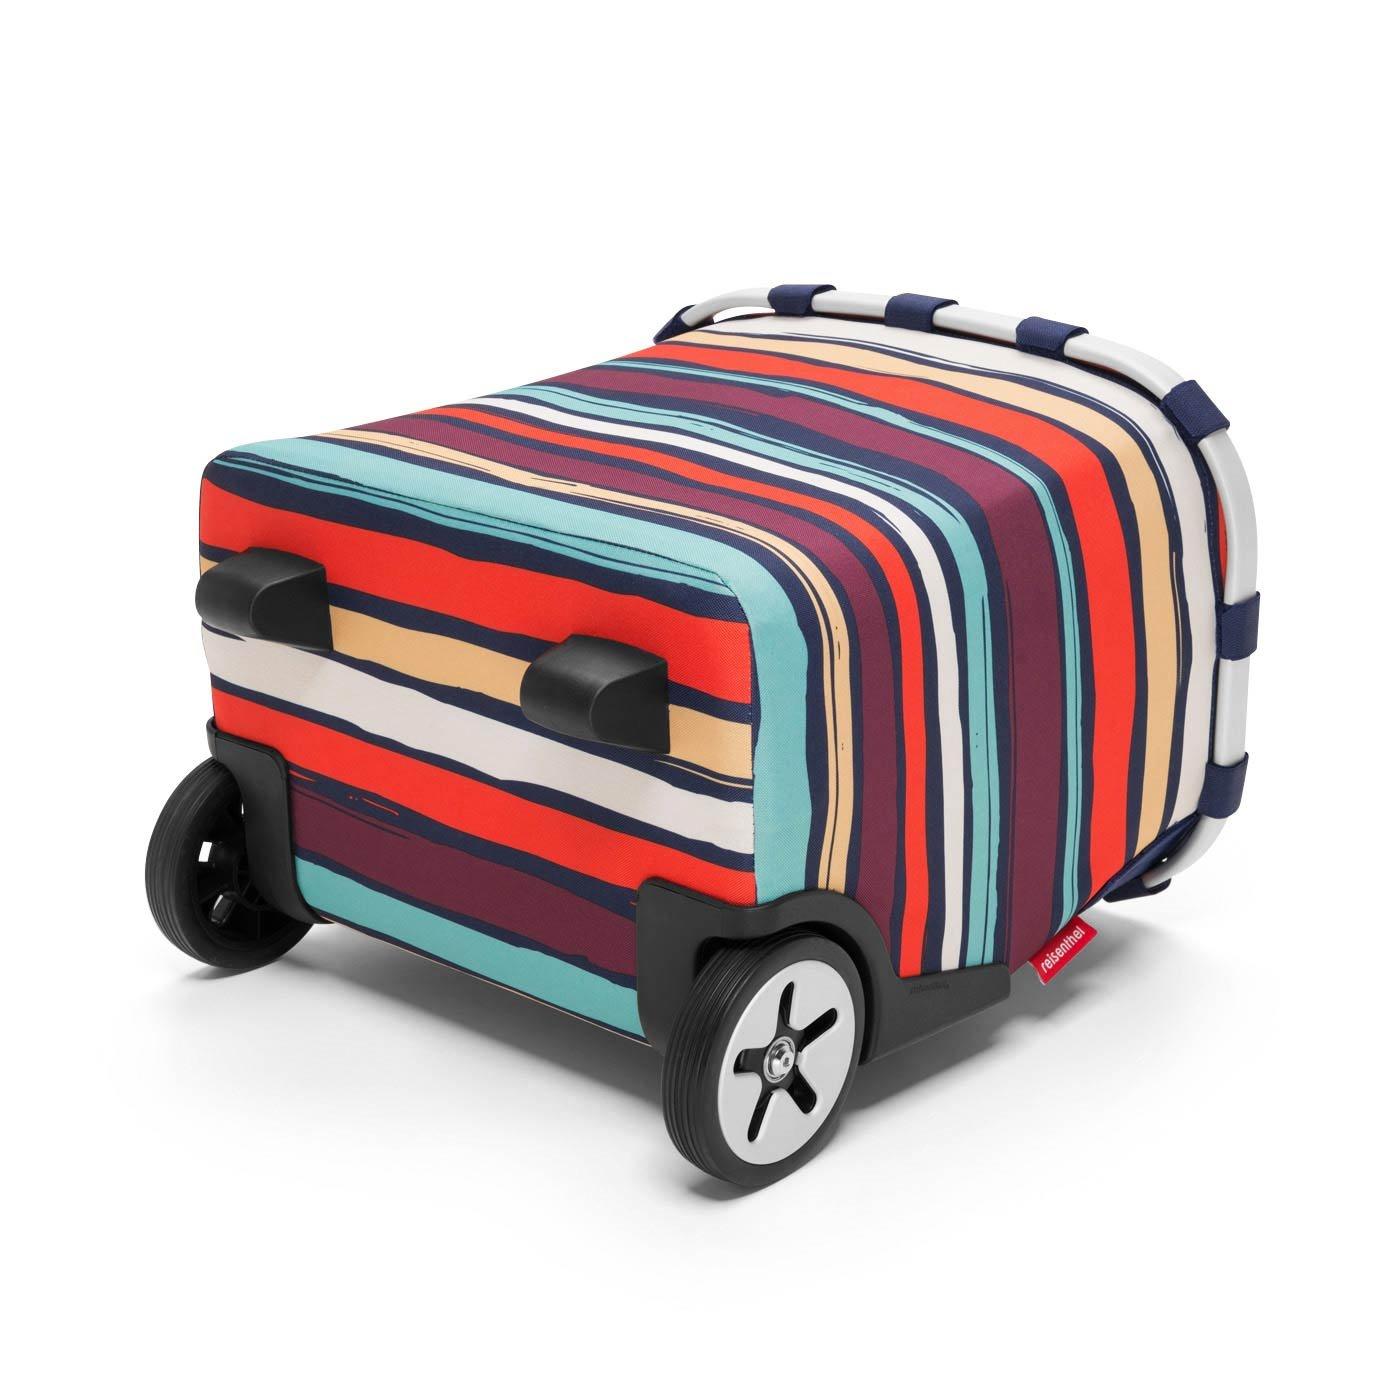 reisenthel Carrycruiser Shopping Trolley, Artist Stripes by reisenthel (Image #4)